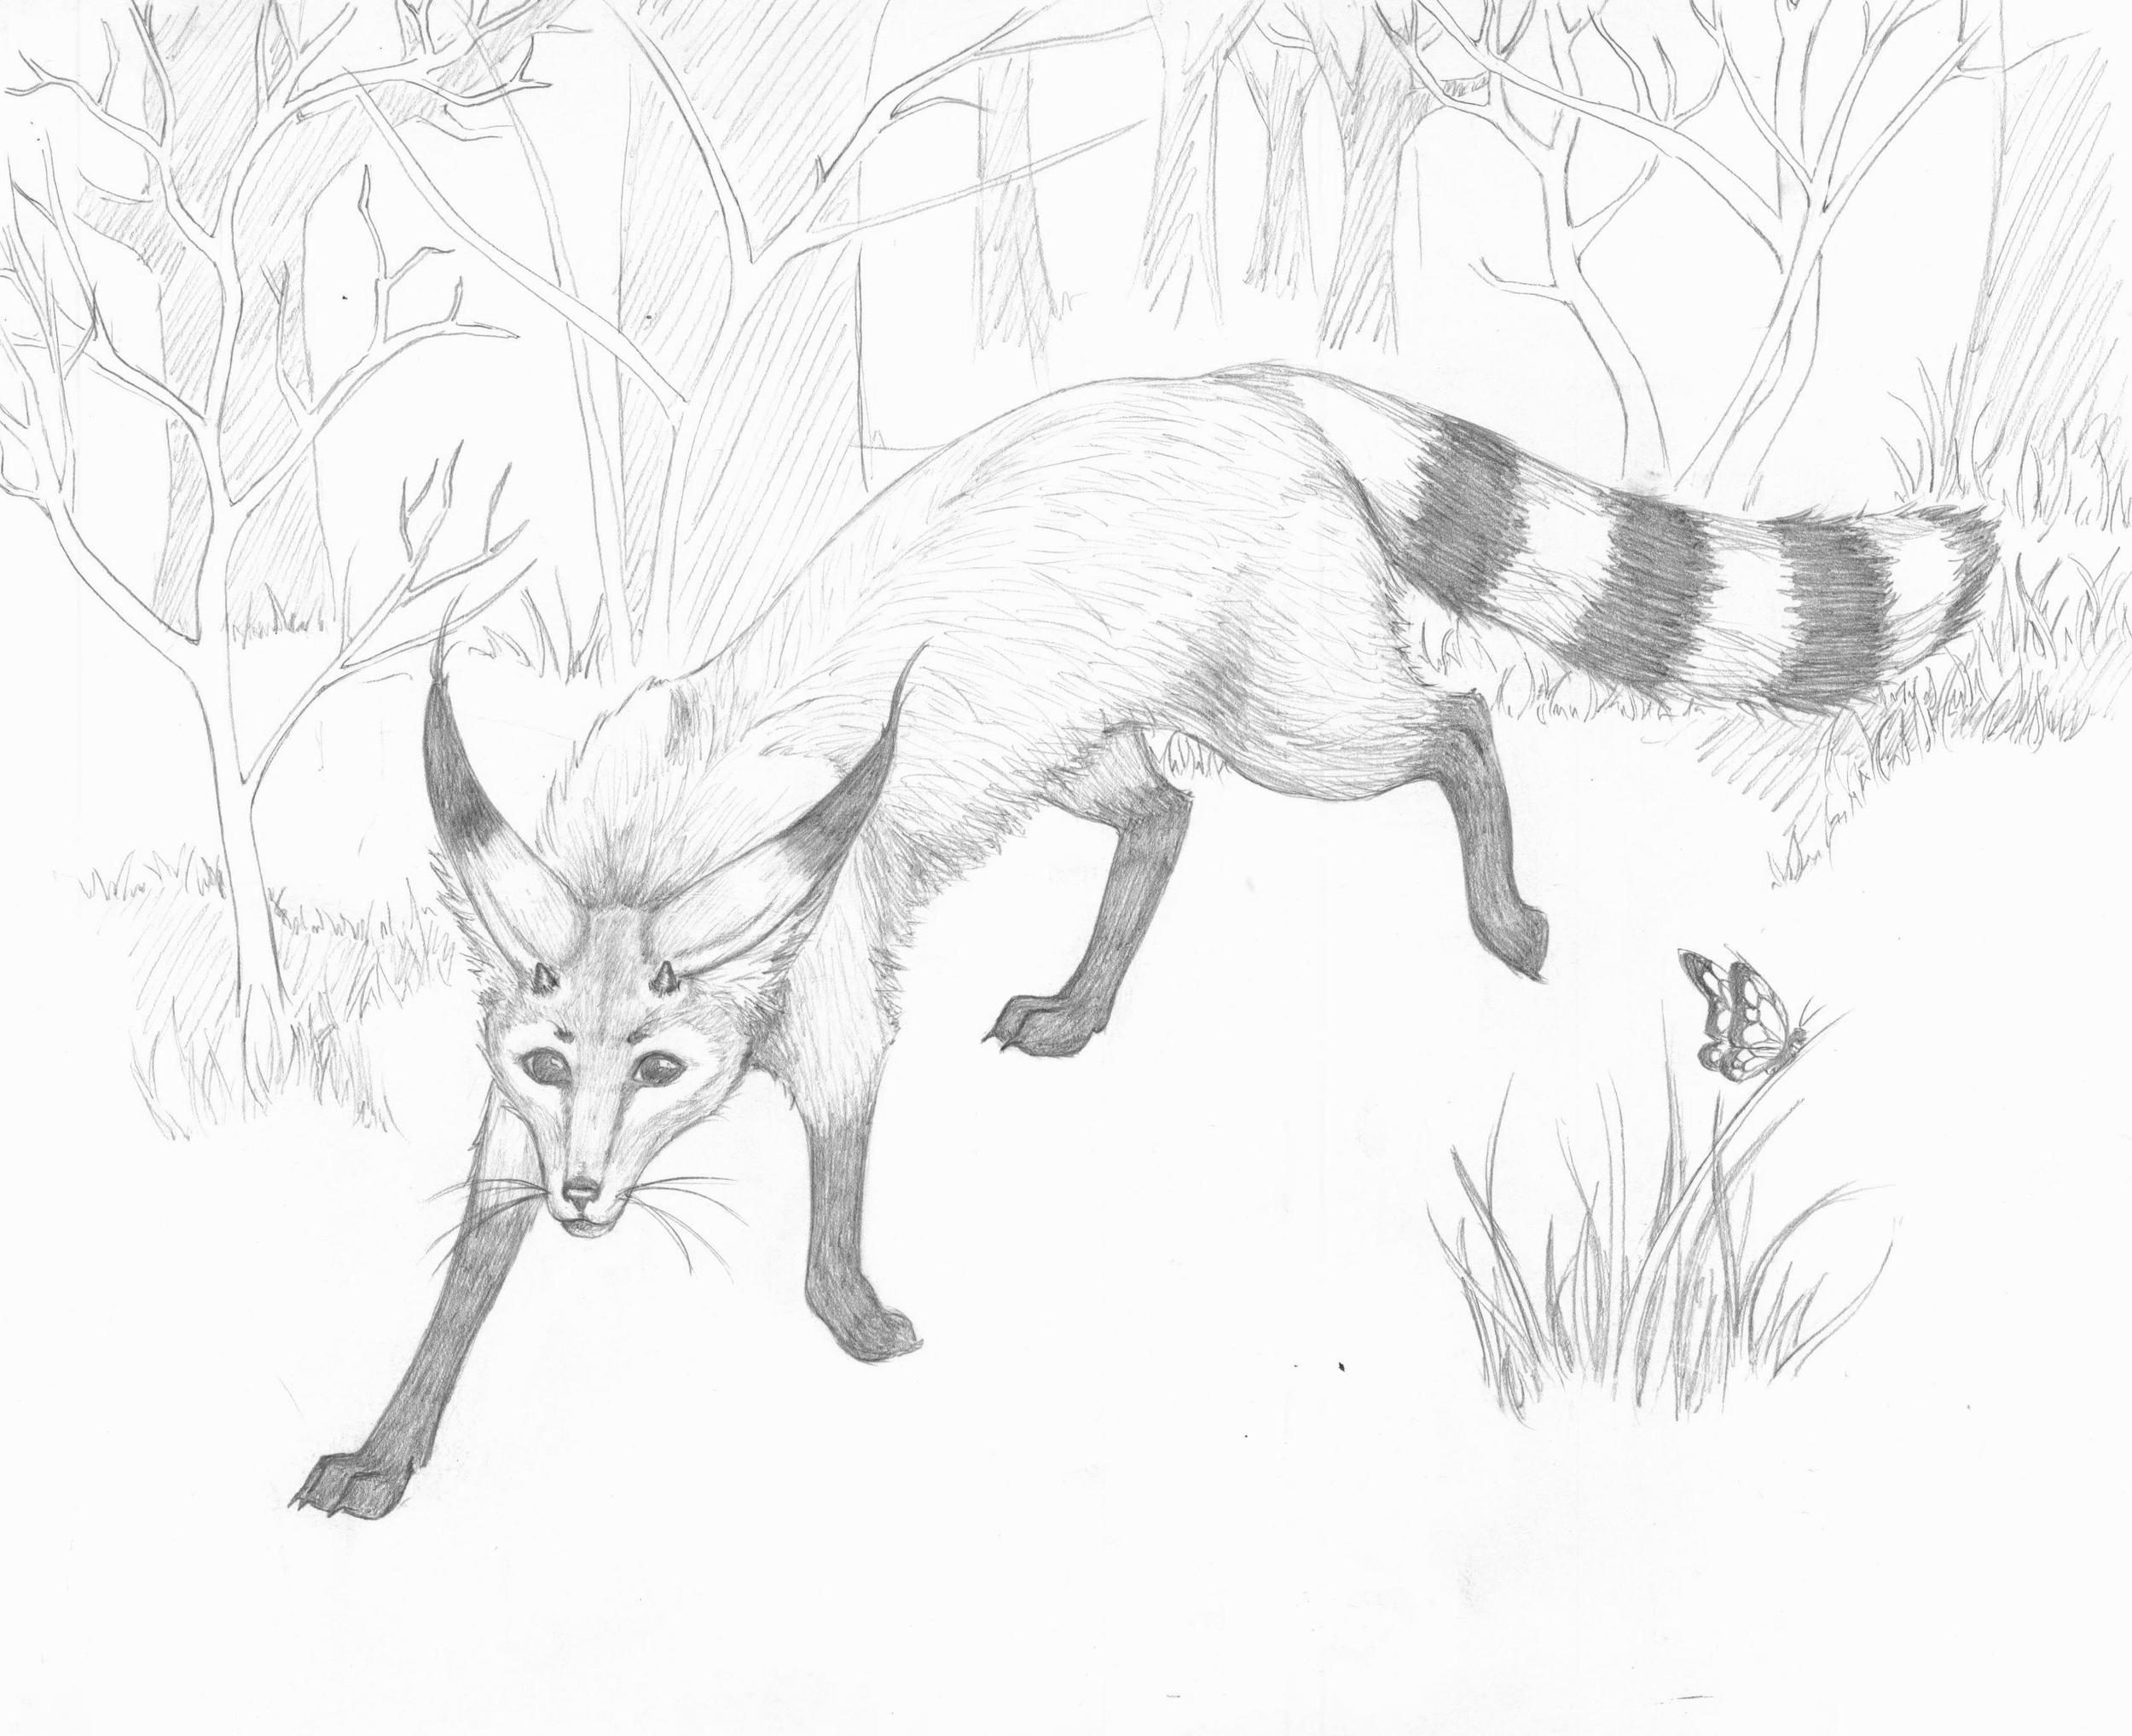 ART2_1310_ZooCreature_Andrew-Ford.jpg